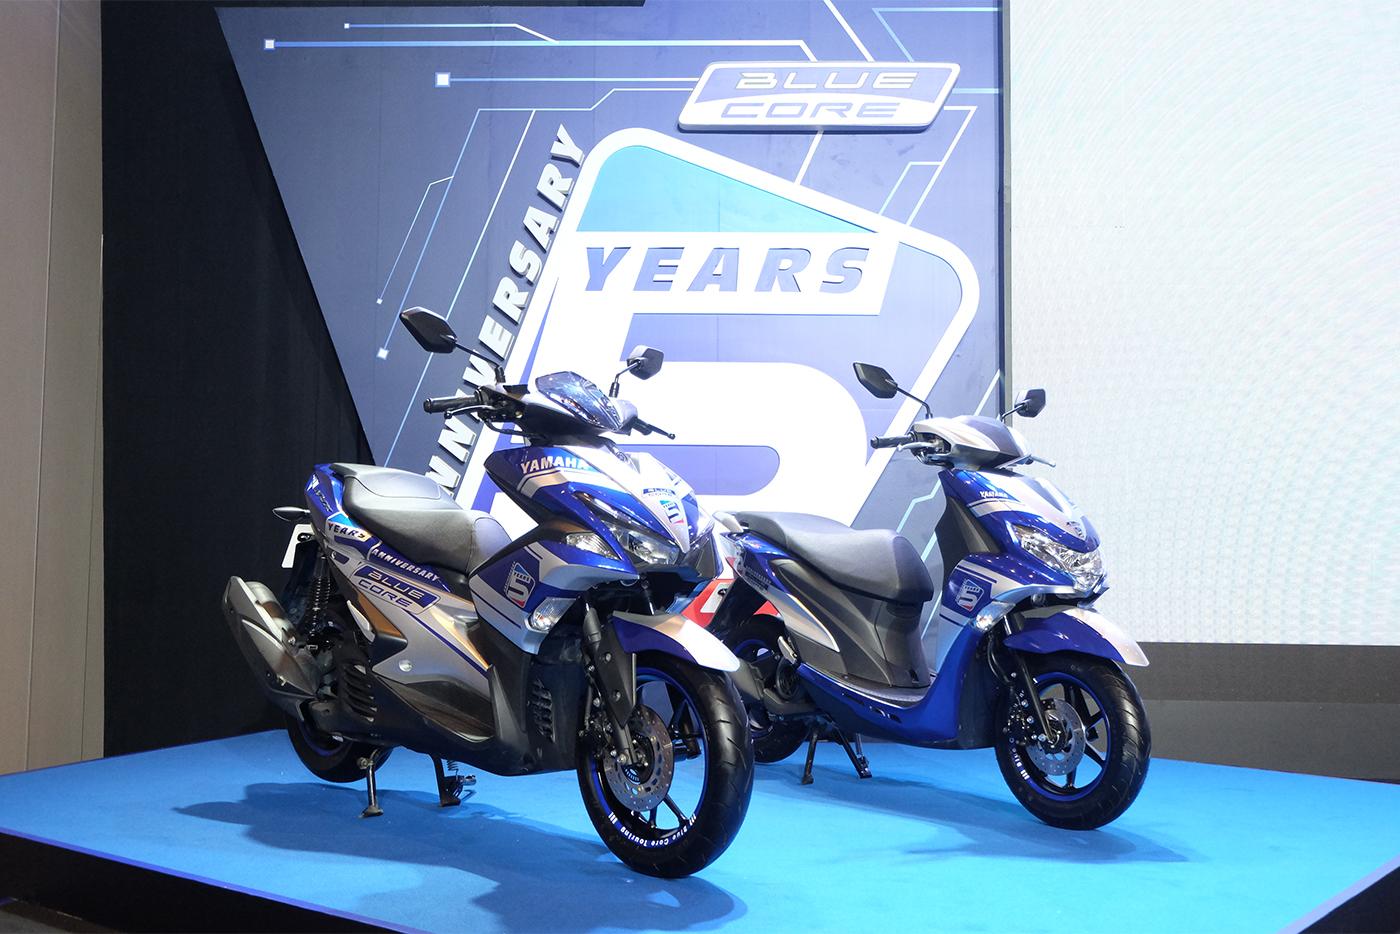 yamaha-motor-viet-nam-ky-niem-5-nam-dong-co-blue-core-va-hanh-trinh-asean-blue-core-touring-4.JPG